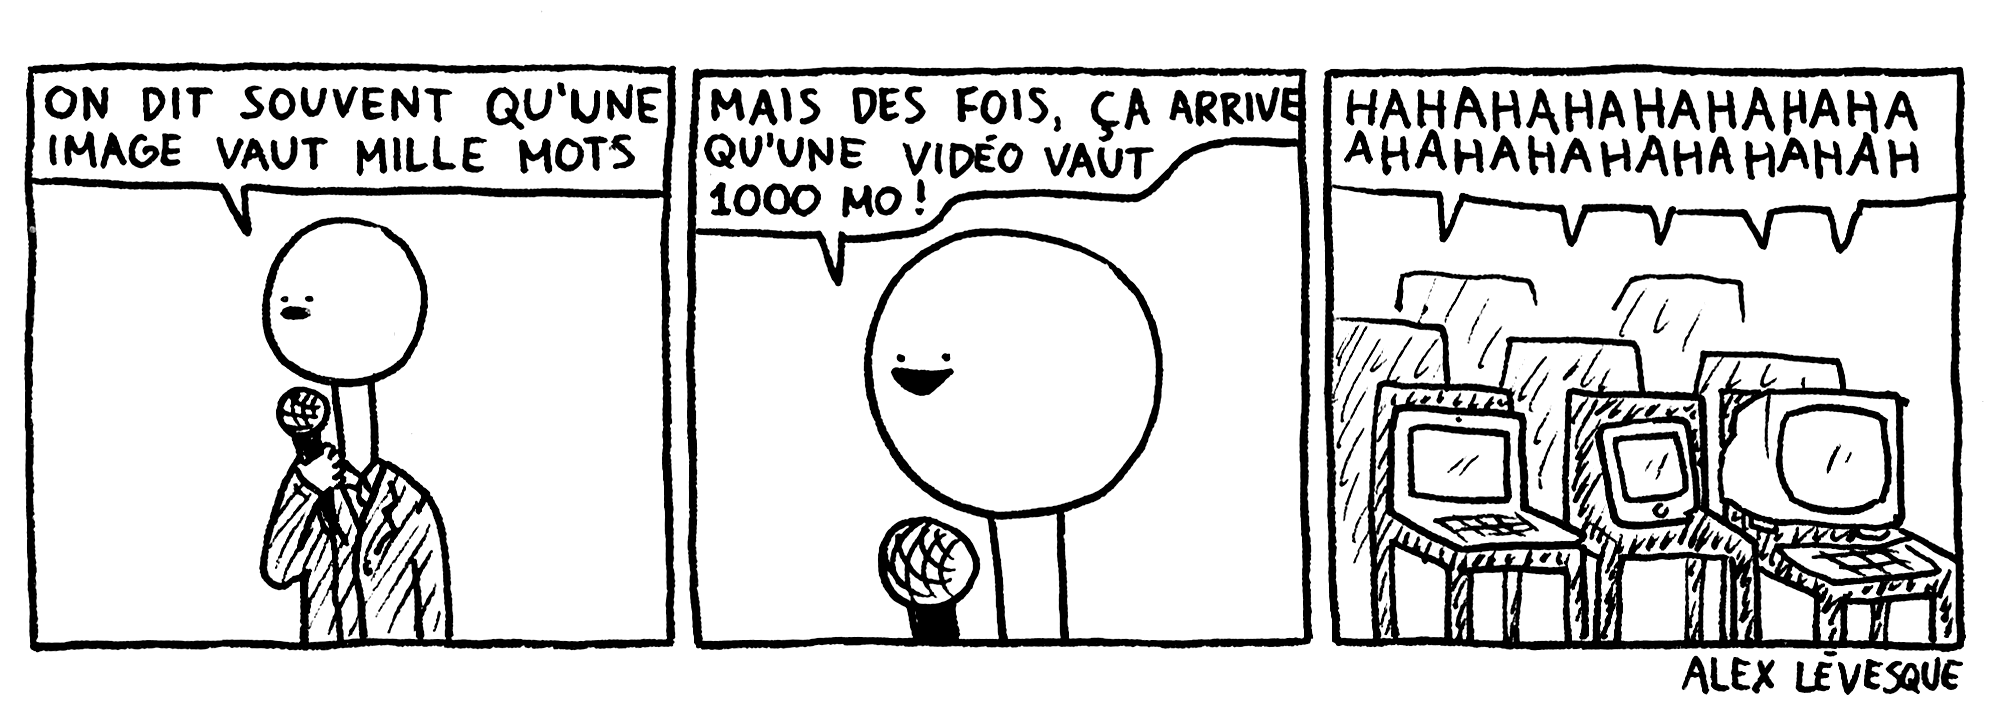 1000 Mo